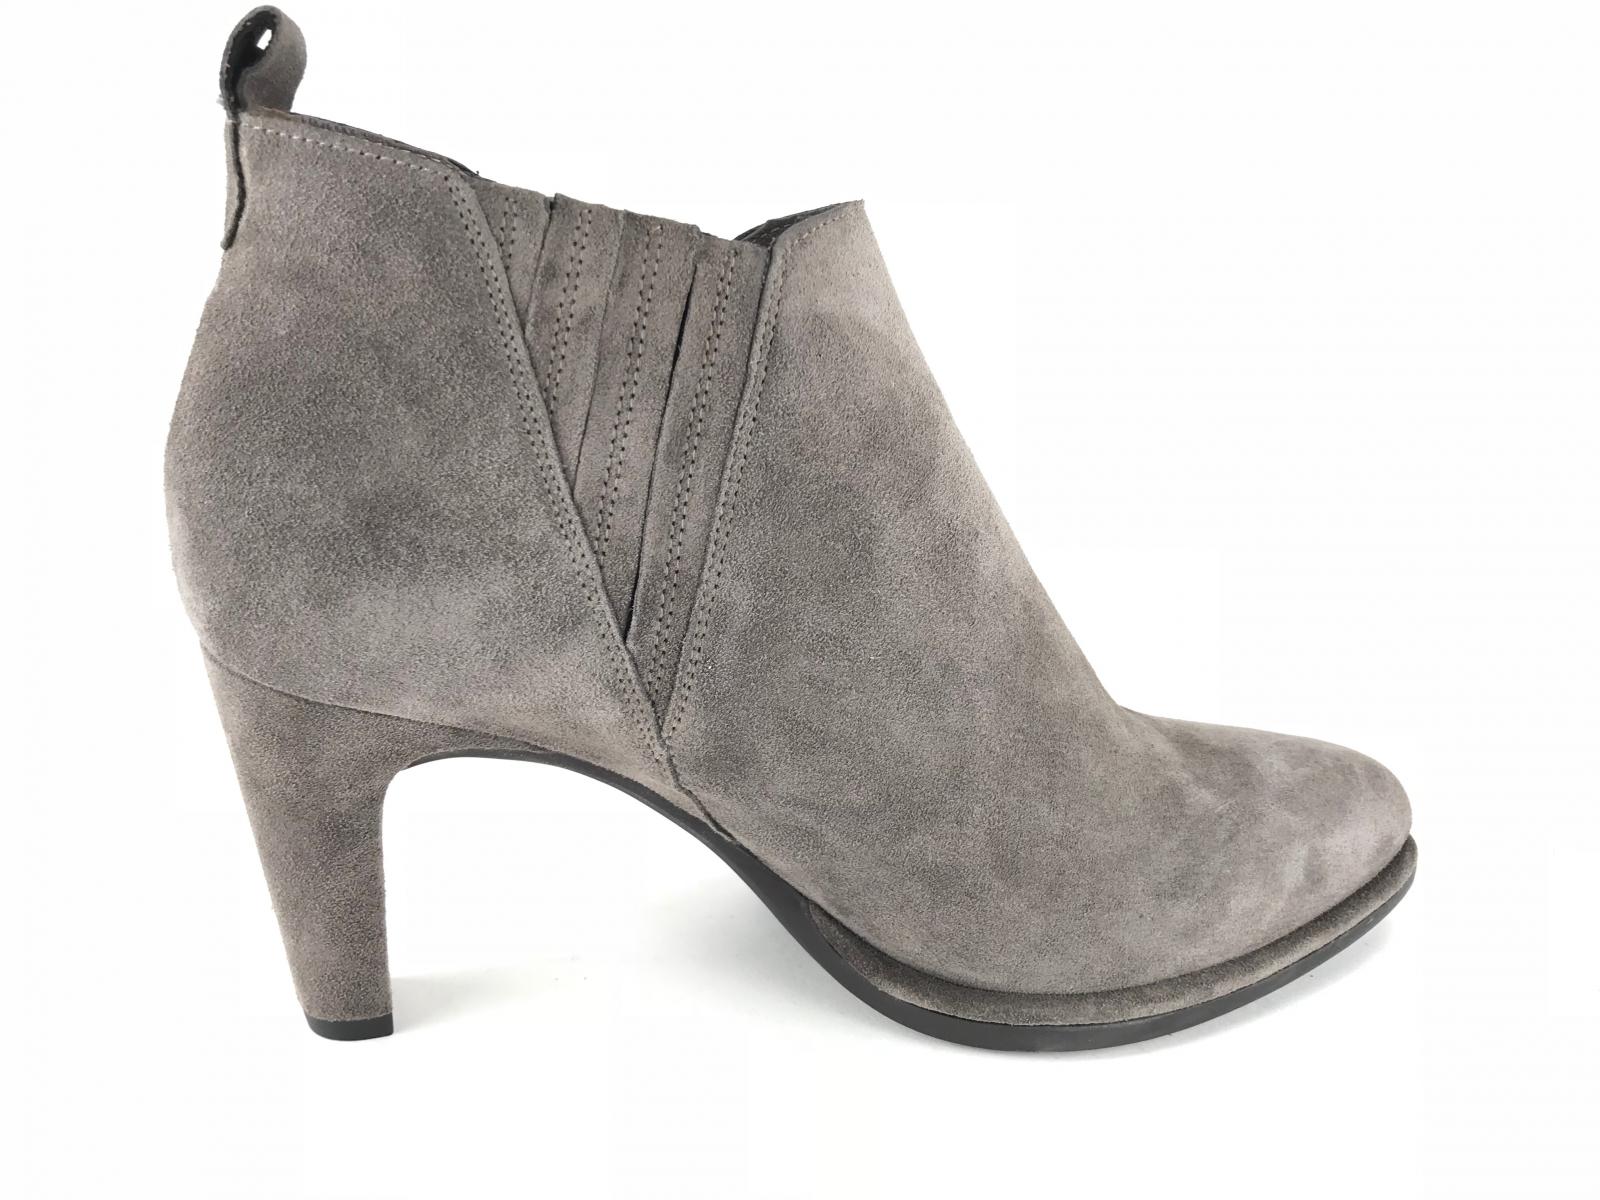 3e6f9c3d76c Wonders støvle - grå - DAME - zjoos-hjoerring.dk